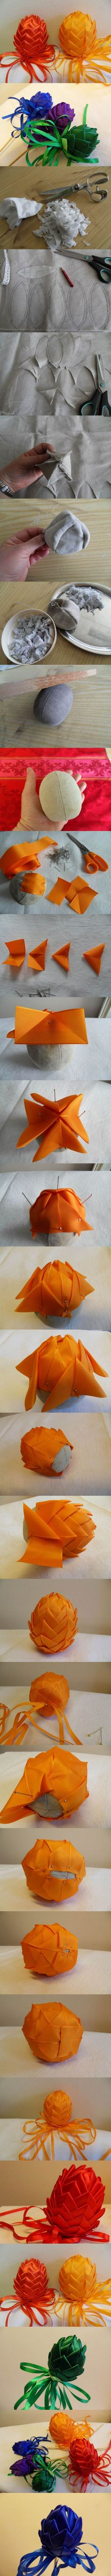 DIY Easter Egg Decoration Artichokes | iCreativeIdeas.com Like Us on Facebook ==> https://www.facebook.com/icreativeideas